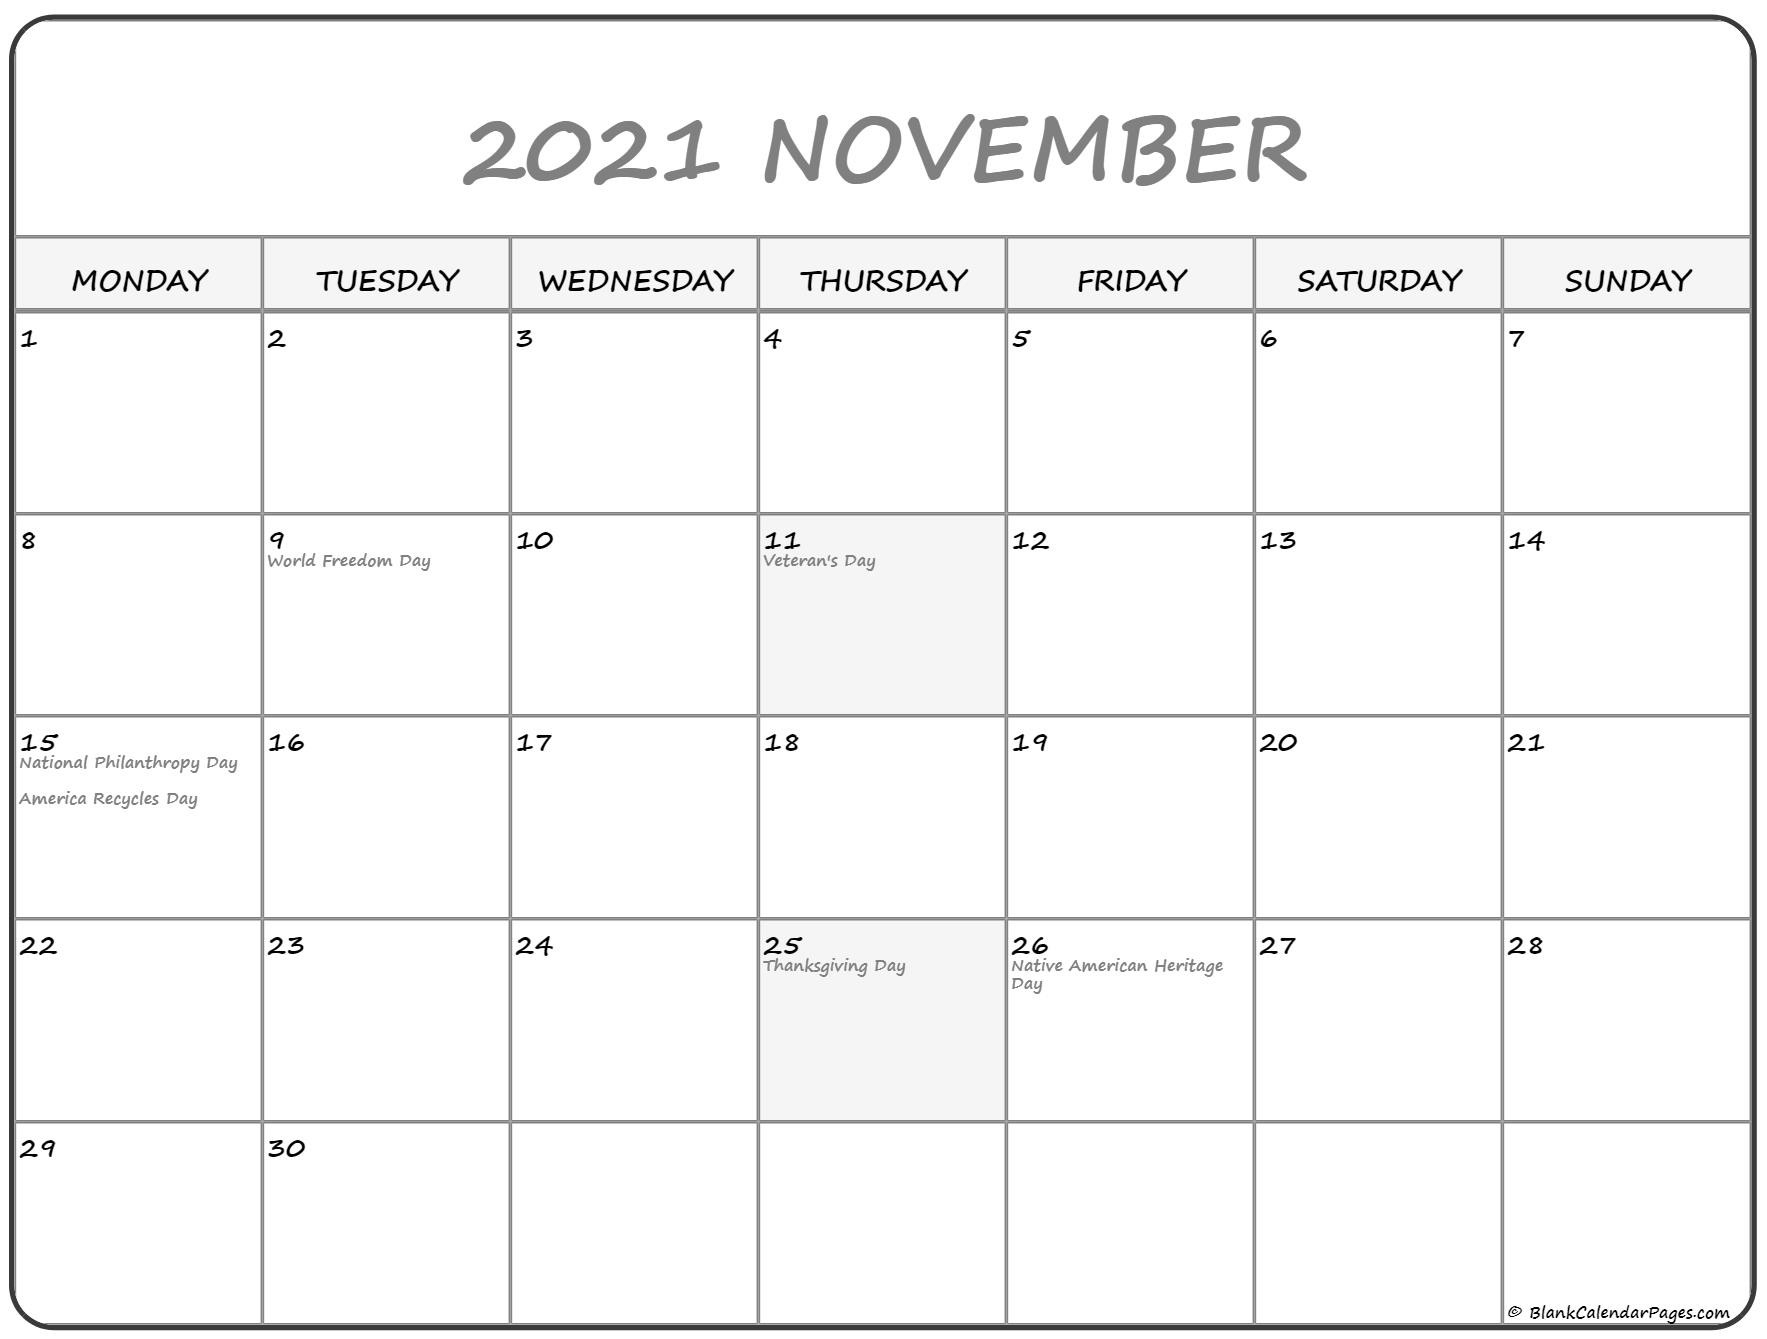 November 2021 Monday Calendar | Monday To Sunday-August 2021 Calendar Monday Through Friday Only